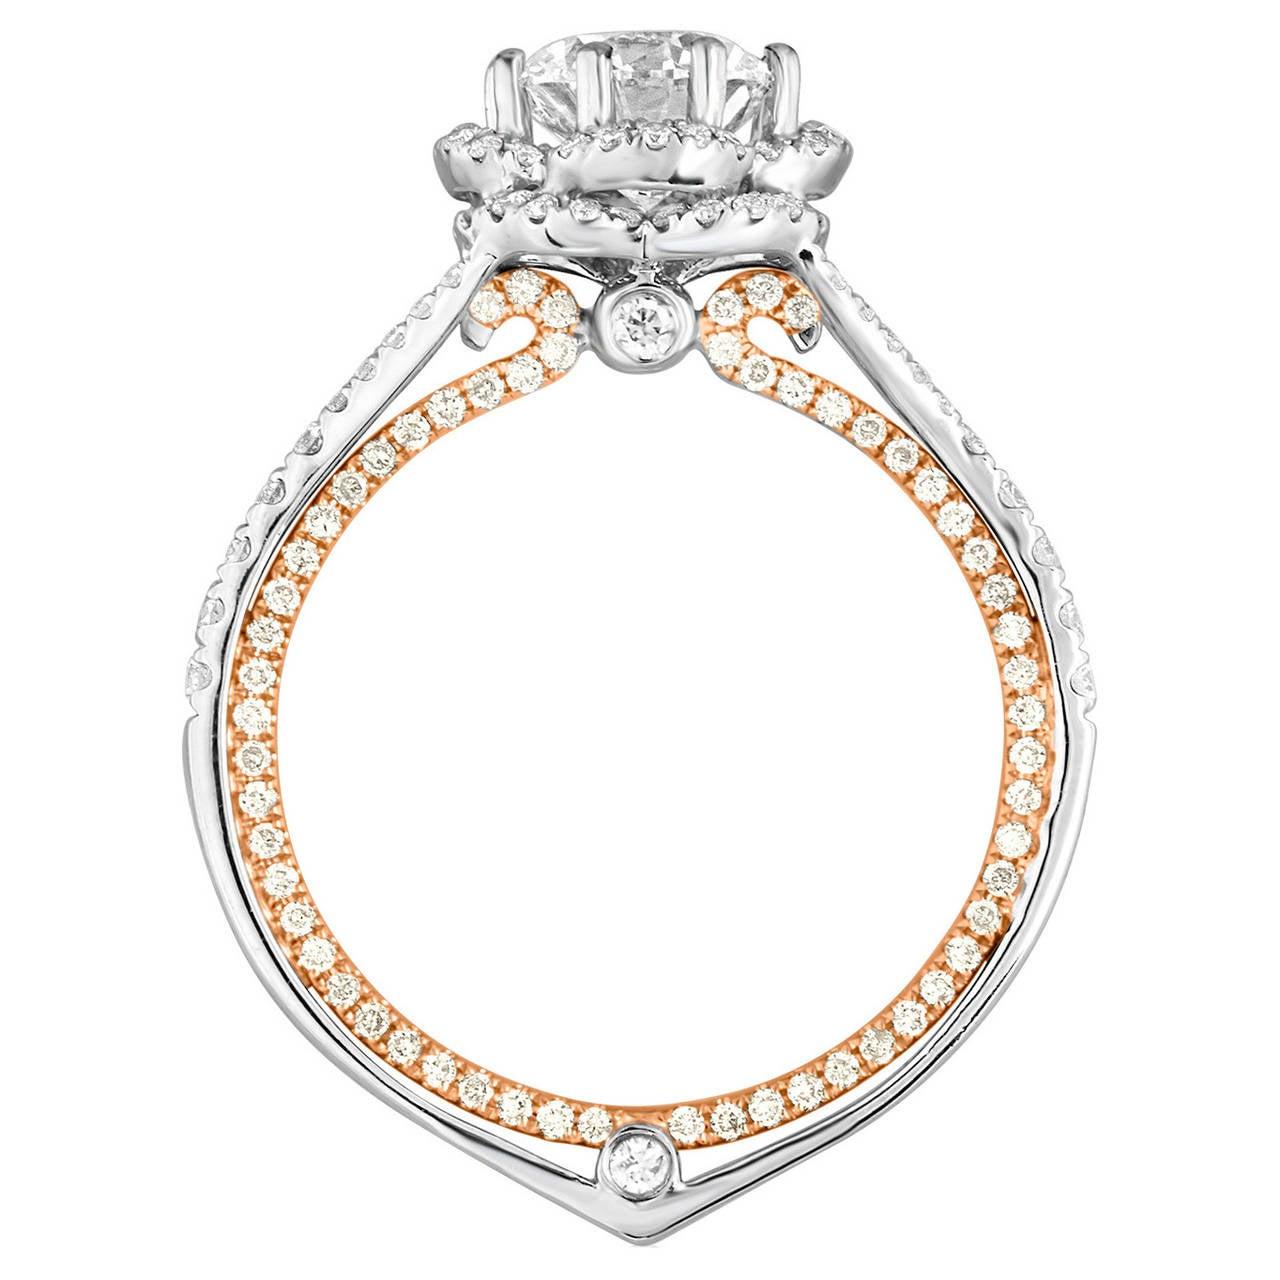 GIA Certified 1.08 Carat F VVS1 Diamond Two-Tone Gold Engagement Ring